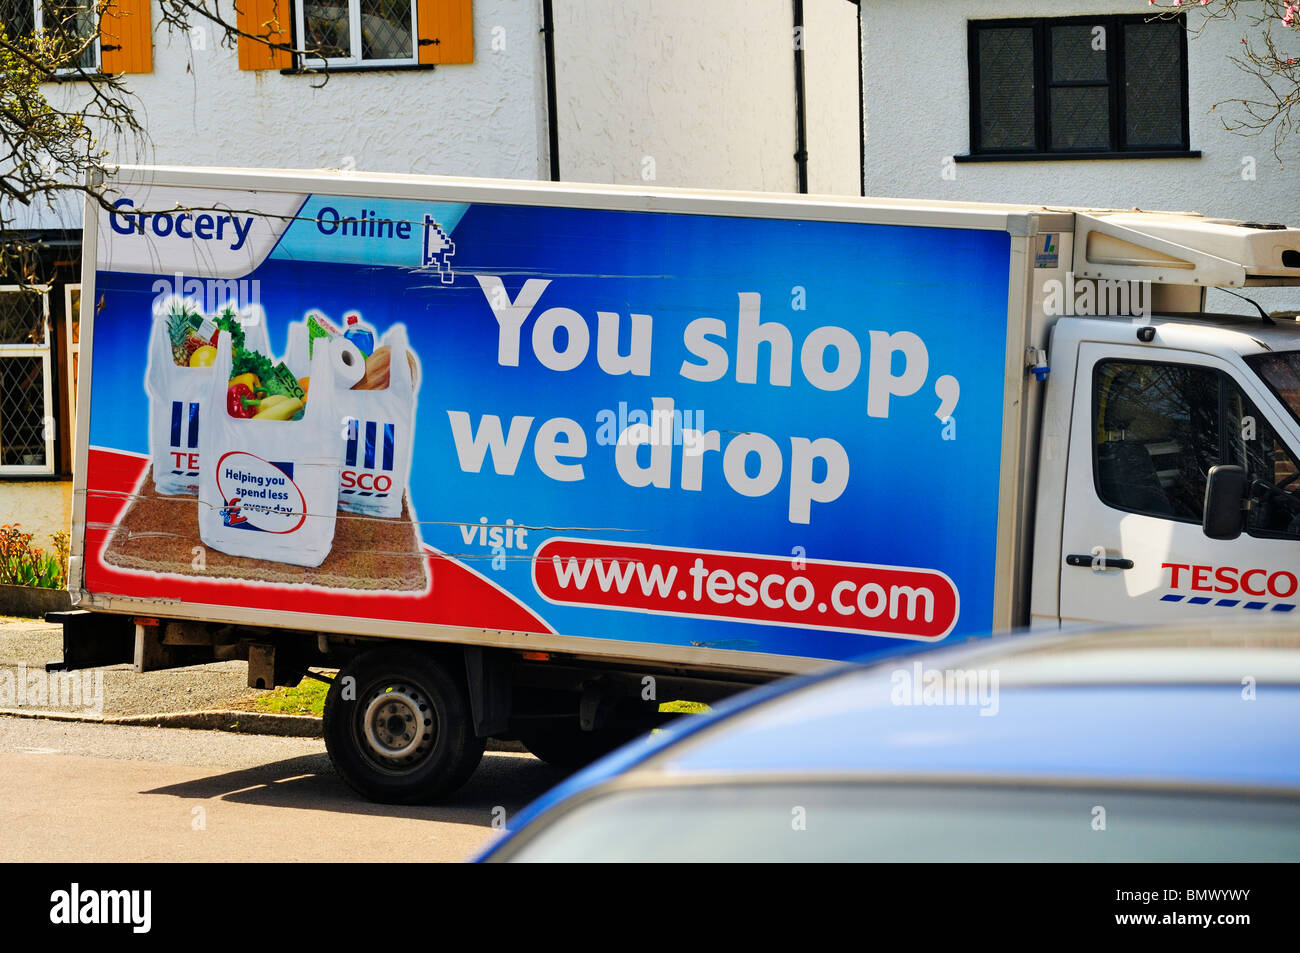 Tesco home delivery van - Stock Image